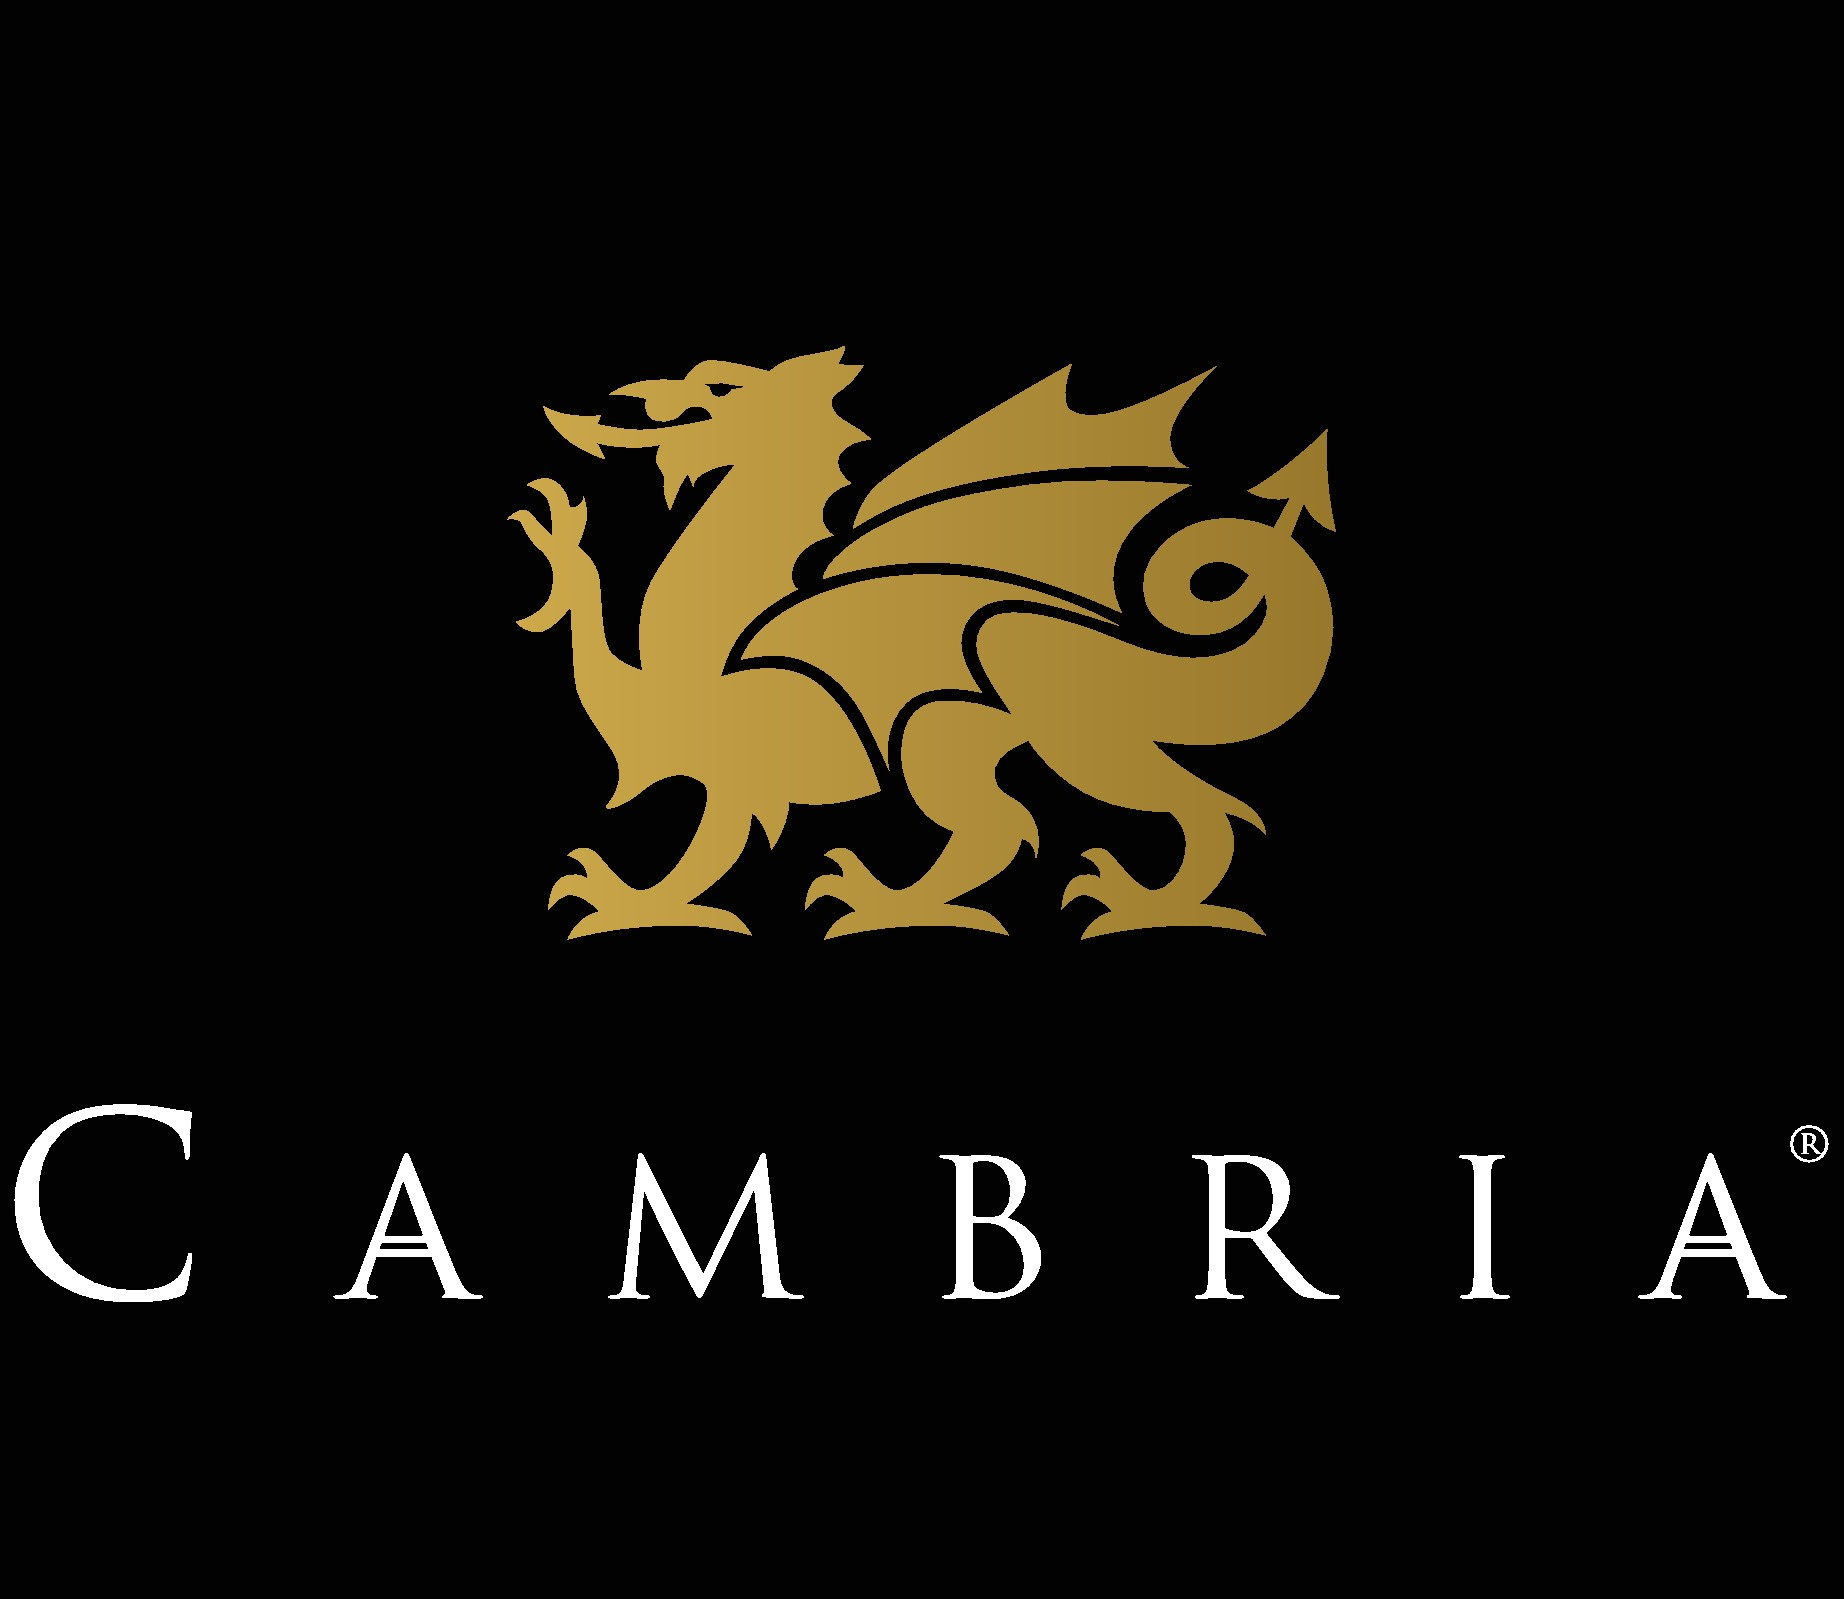 cambria_V_BBack_gradient (8).jpg